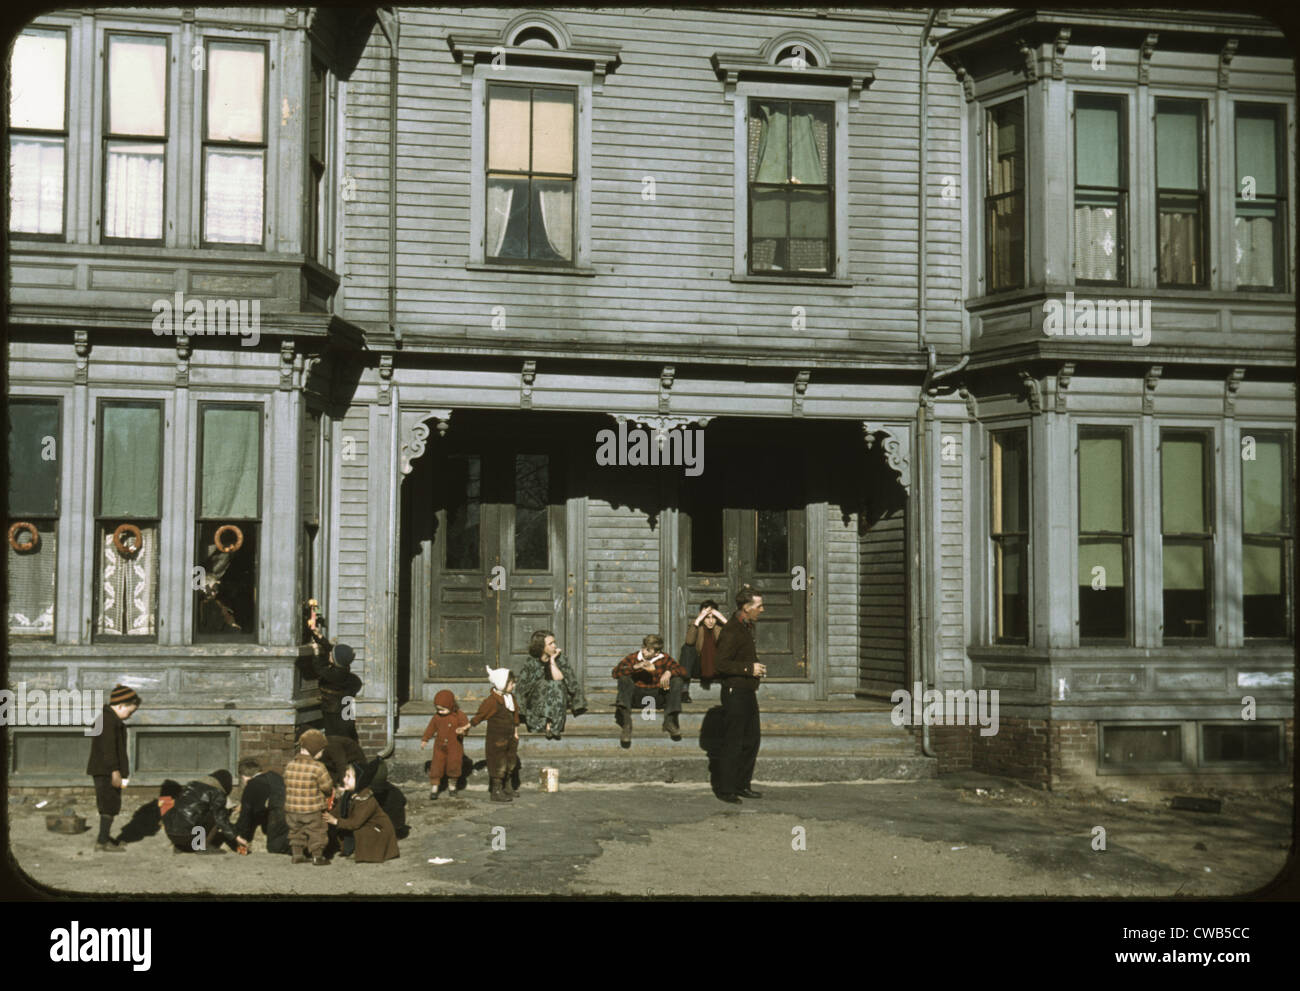 1940s Massachusetts Stock Photos & 1940s Massachusetts Stock Images